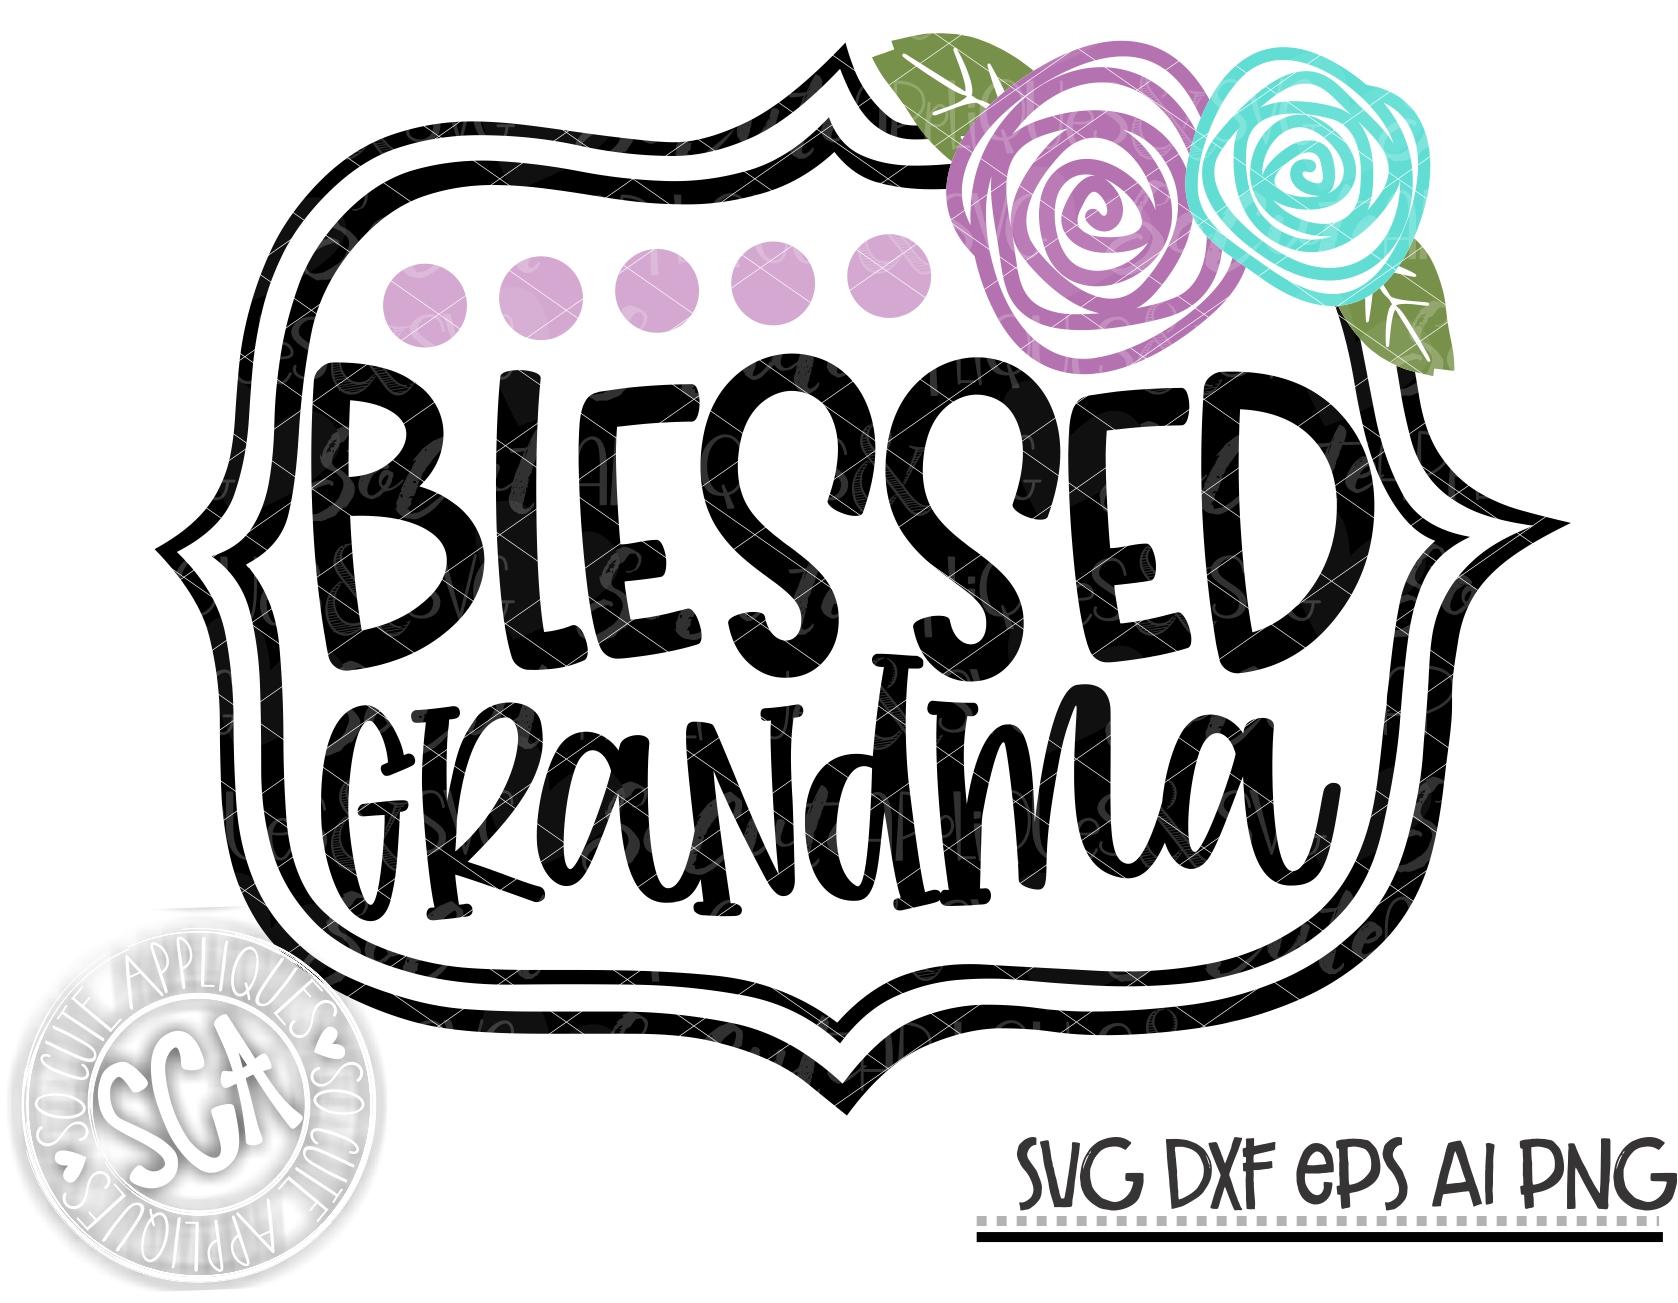 Download Blessed grandma flower frame SVG SCA 20 - socuteappliques.net